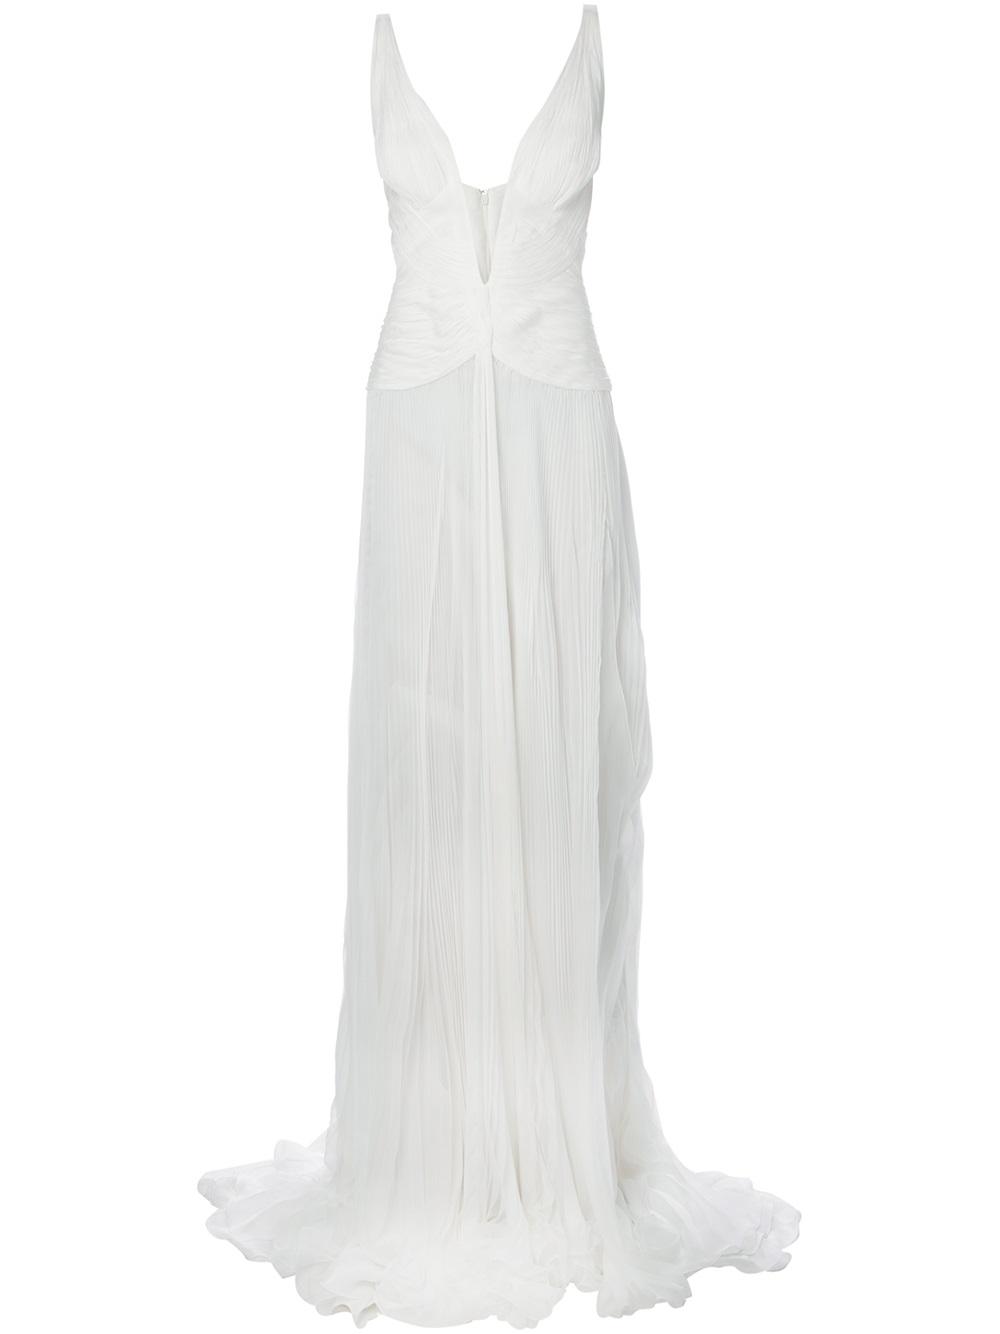 Lyst - Roberto Cavalli Plunge Neck Evening Dress in White 7a177ce97